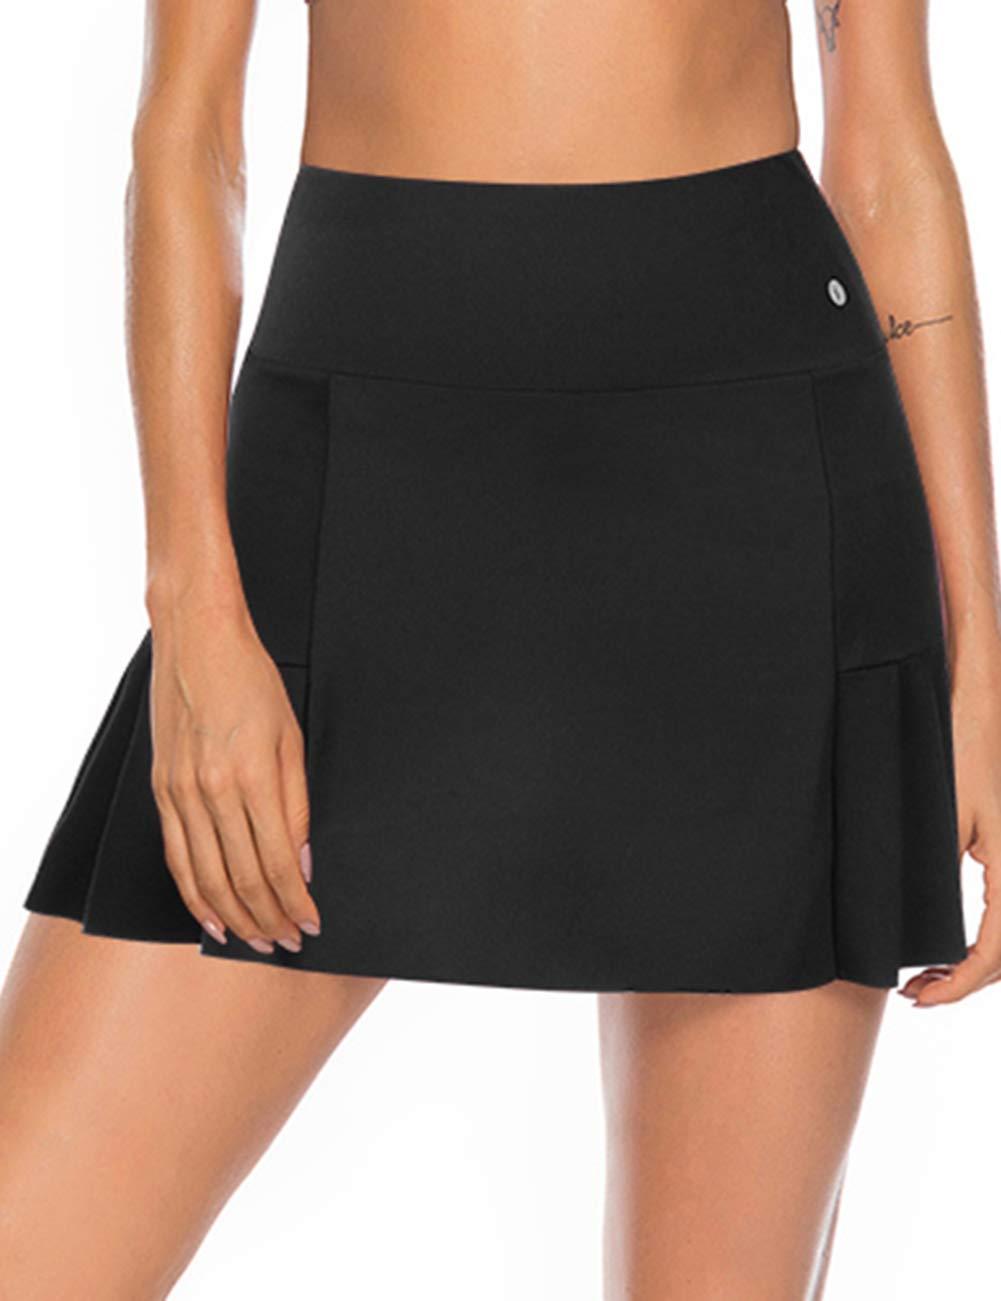 JOYMODE Women's Athletic Skort with Pockets Running Tennis Golf Workout Skirt